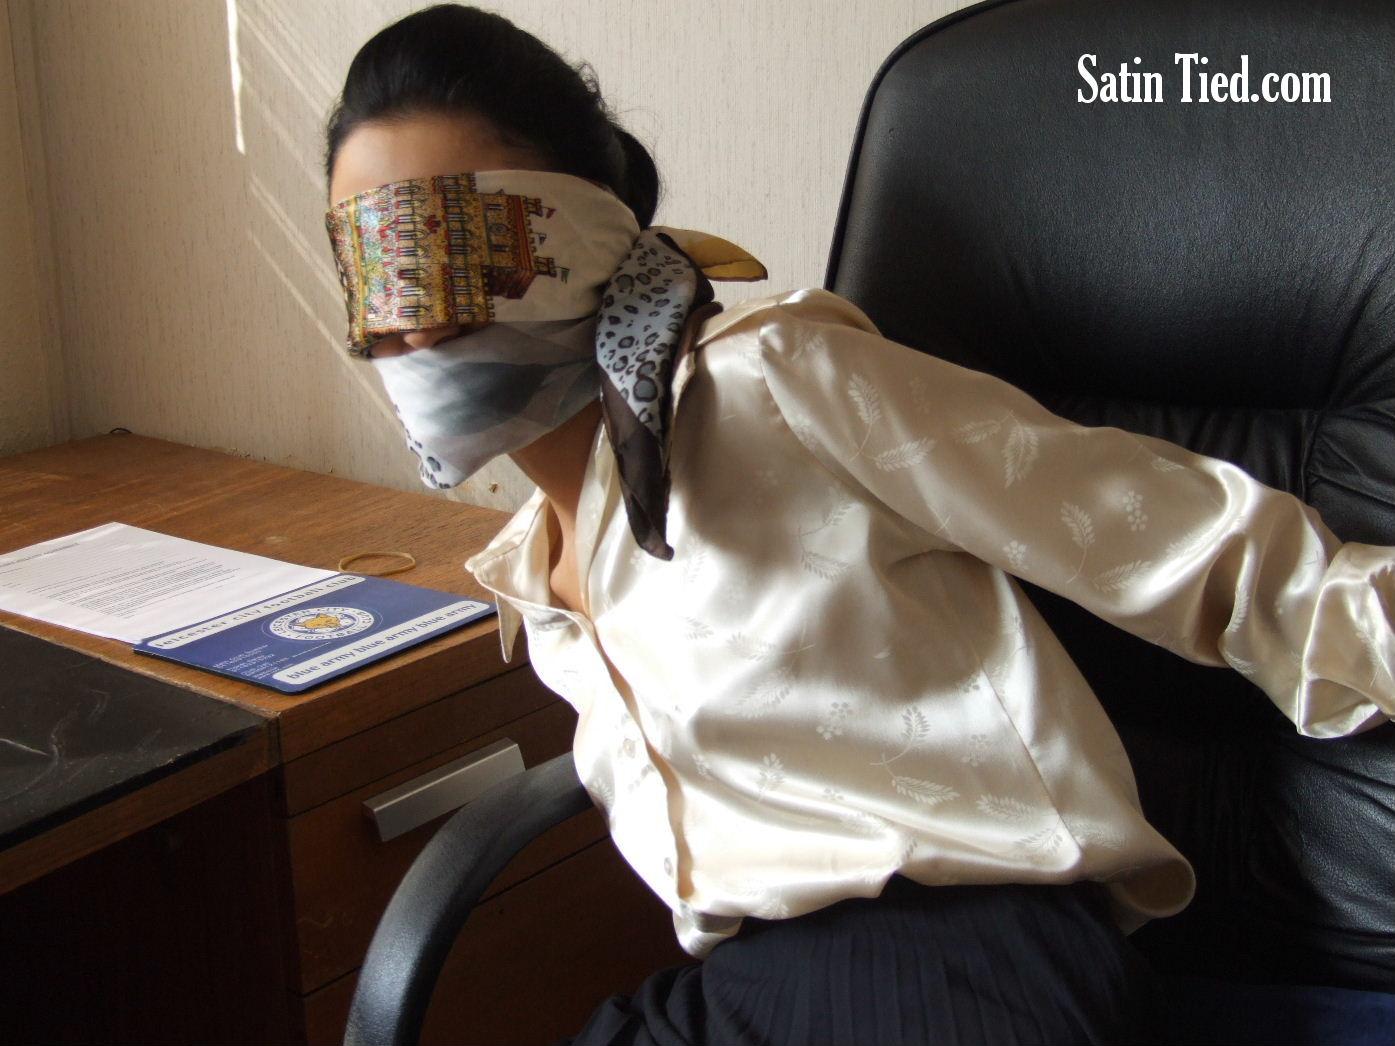 Satin Tied: Office Satin Captive